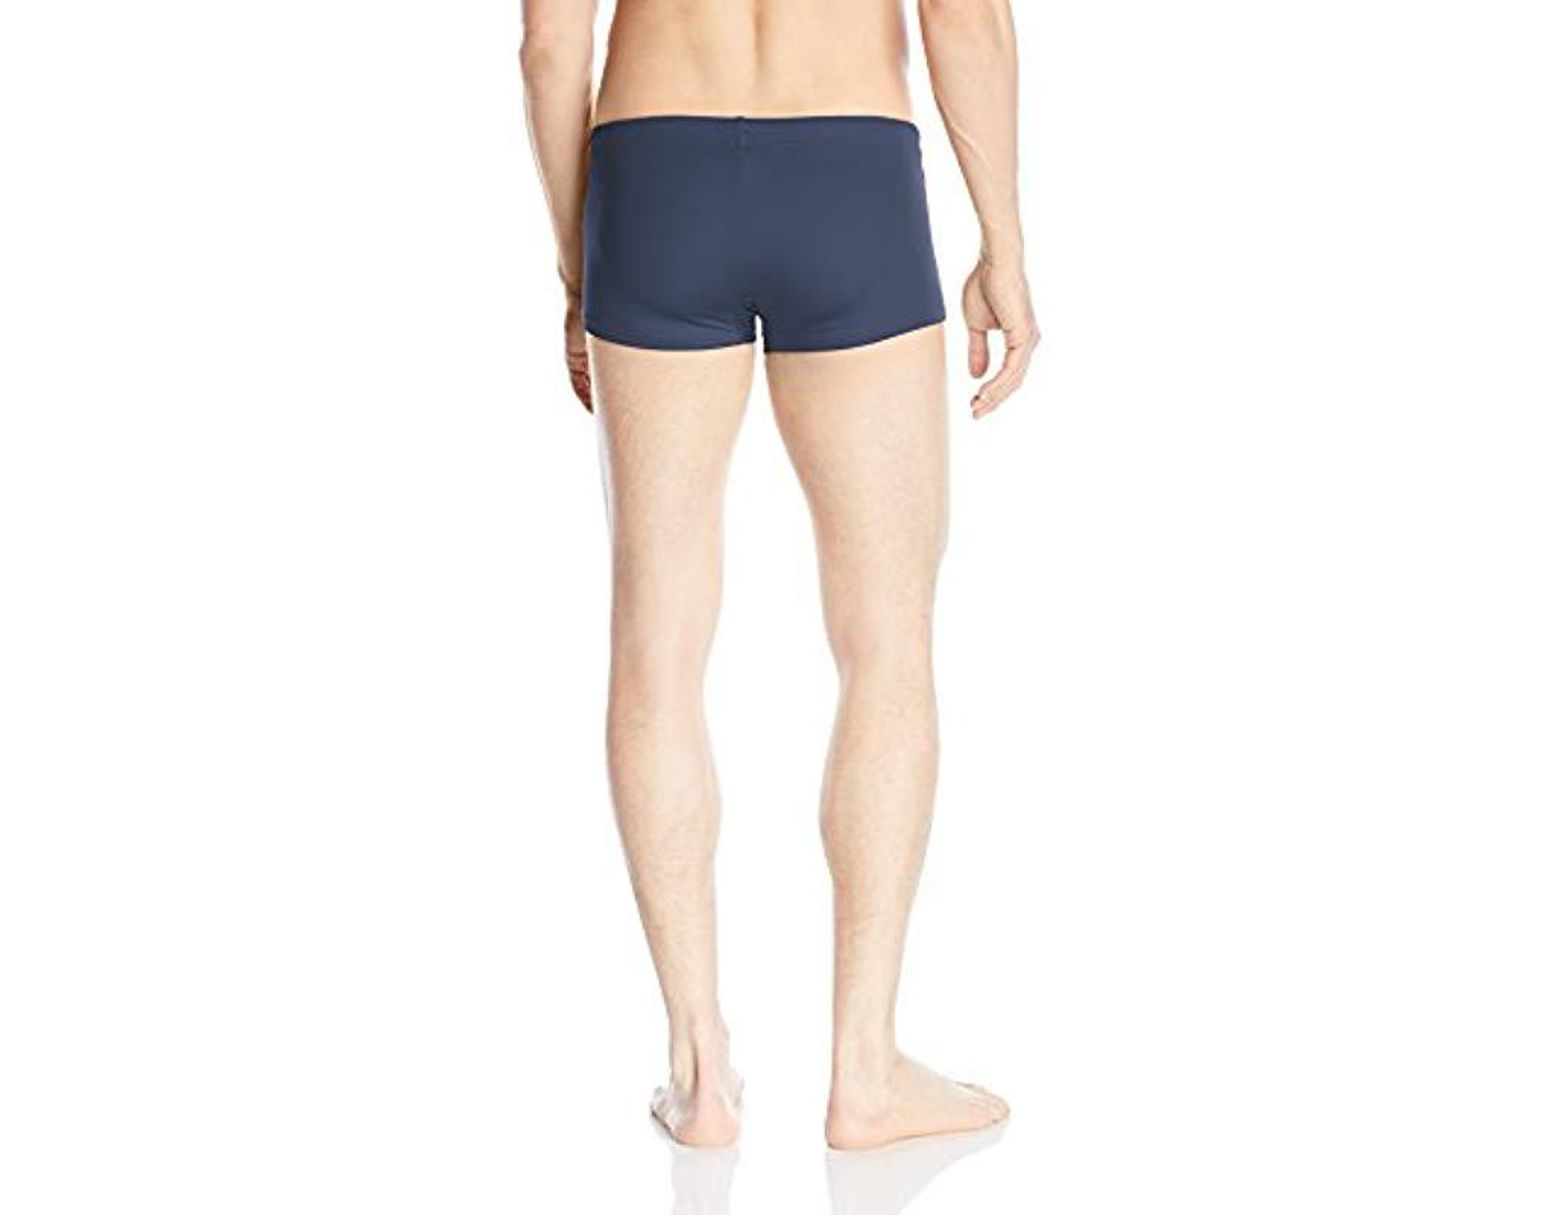 188fe4fee7 Emporio Armani Basic Sea World Swim Trunk in Blue for Men - Save 40% - Lyst